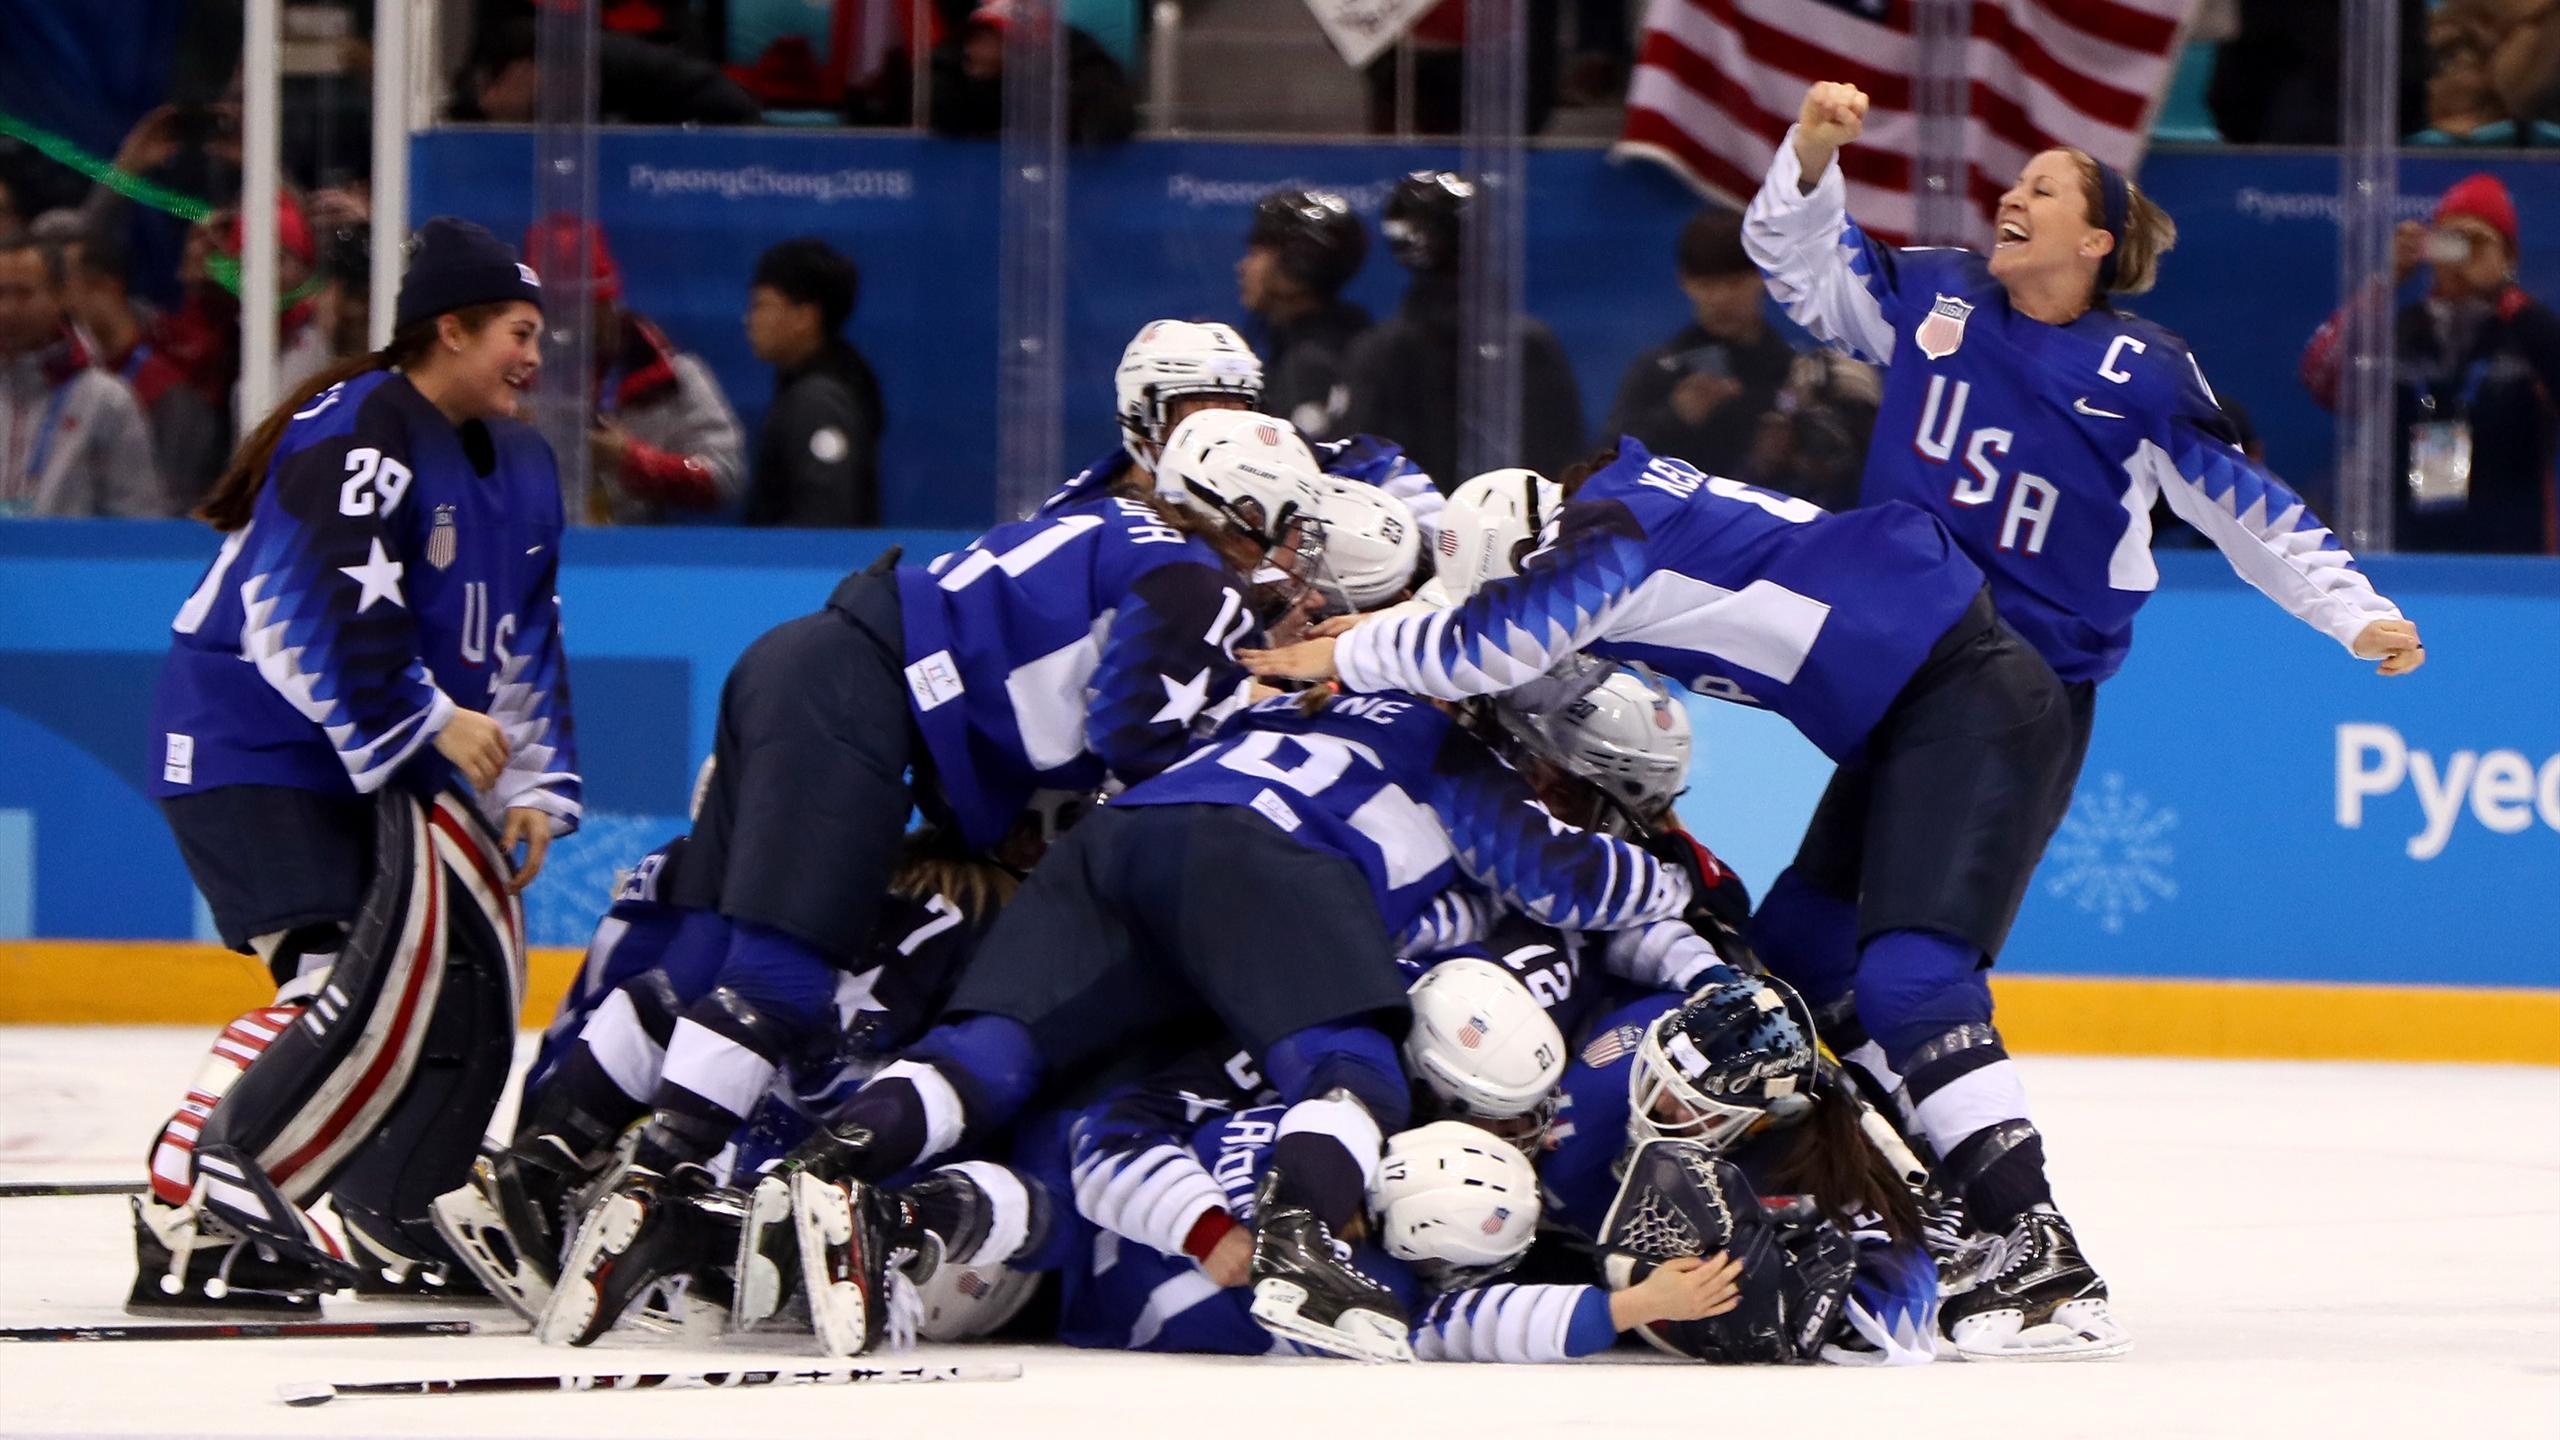 Eishockey Olympia Ergebnisse